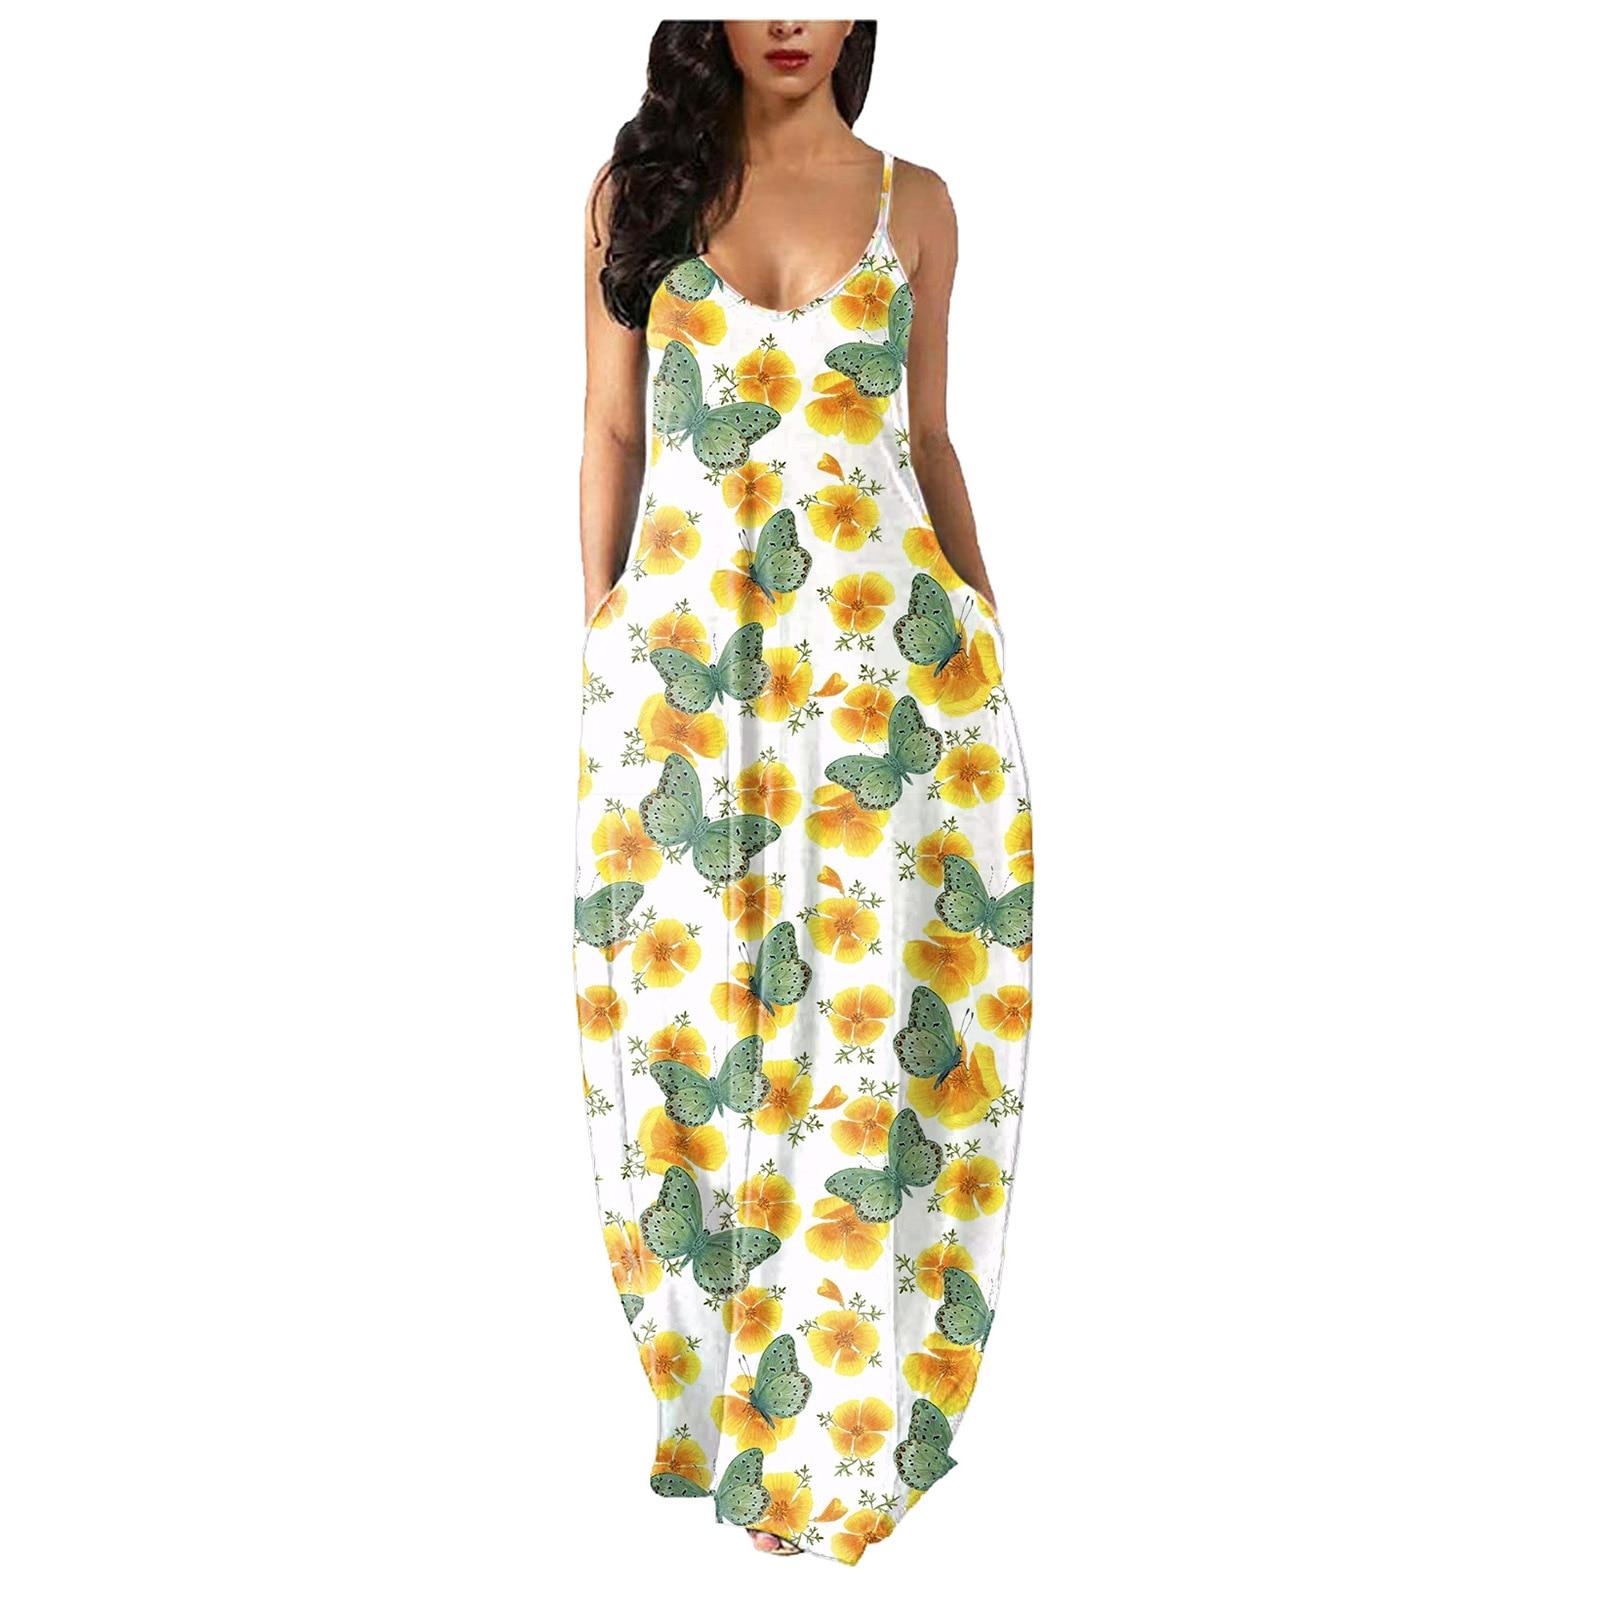 2021 summer new large women's sexy V-neck pocket strap print dress